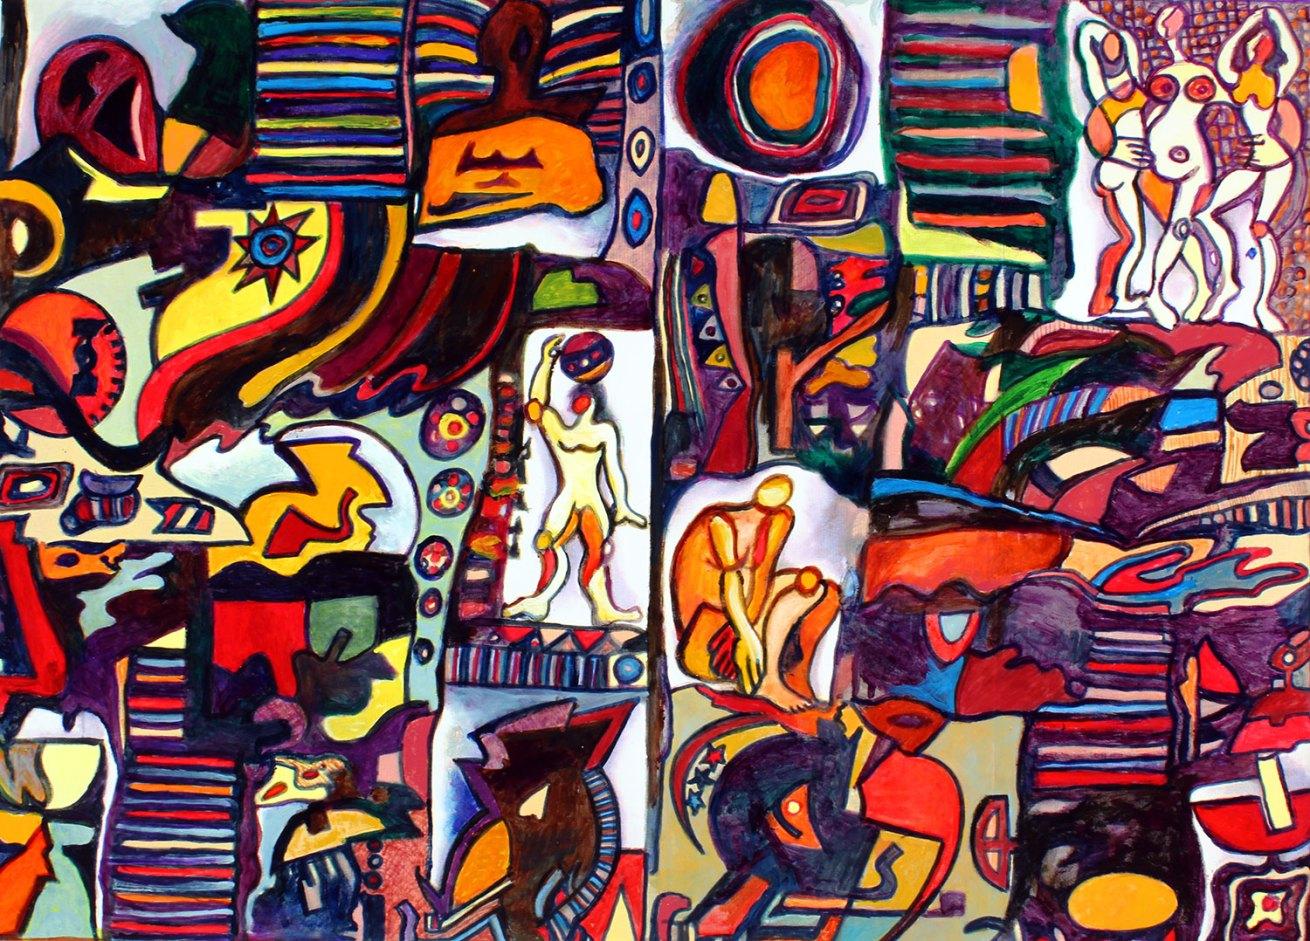 "Intalgio Transitional PTGS 38"" x 52.5"" Mixed Media on Canvas"